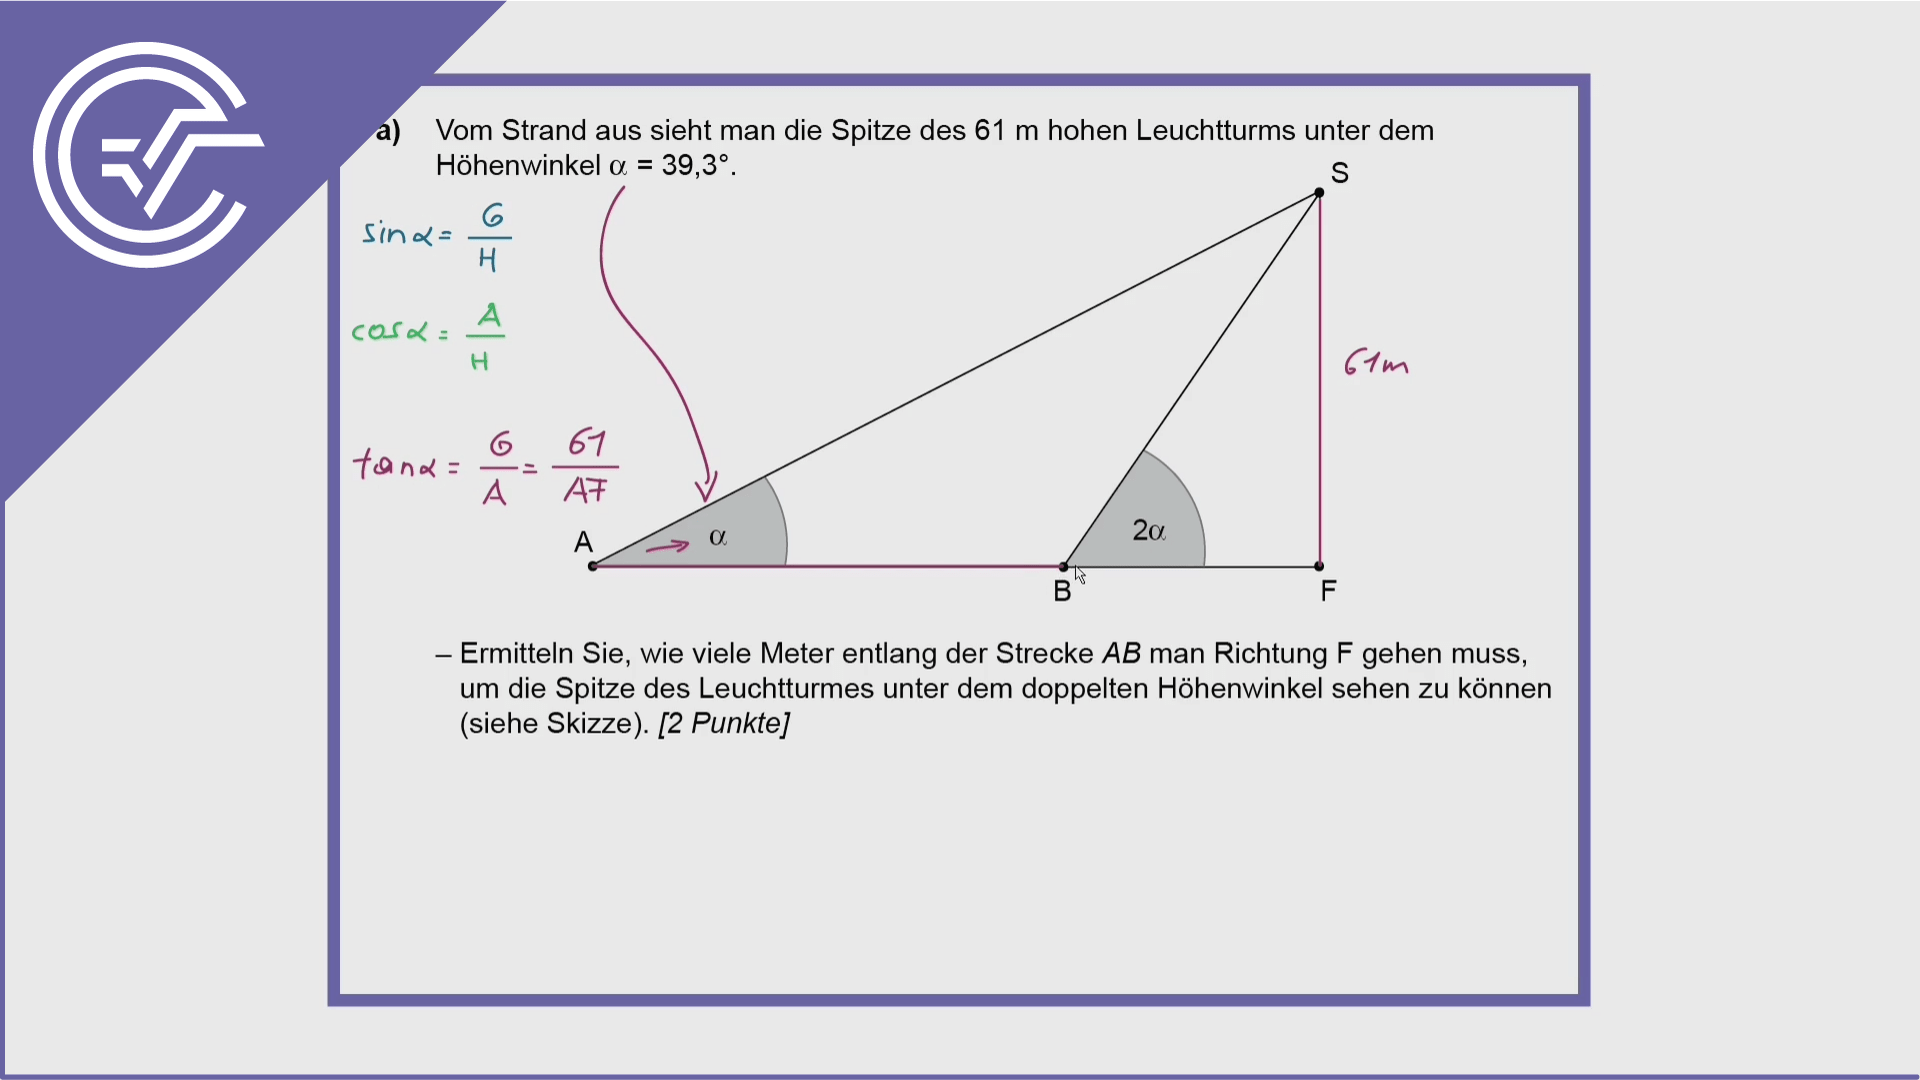 Zentralmatura Aufgabe 5a - Dreiecke berechnen